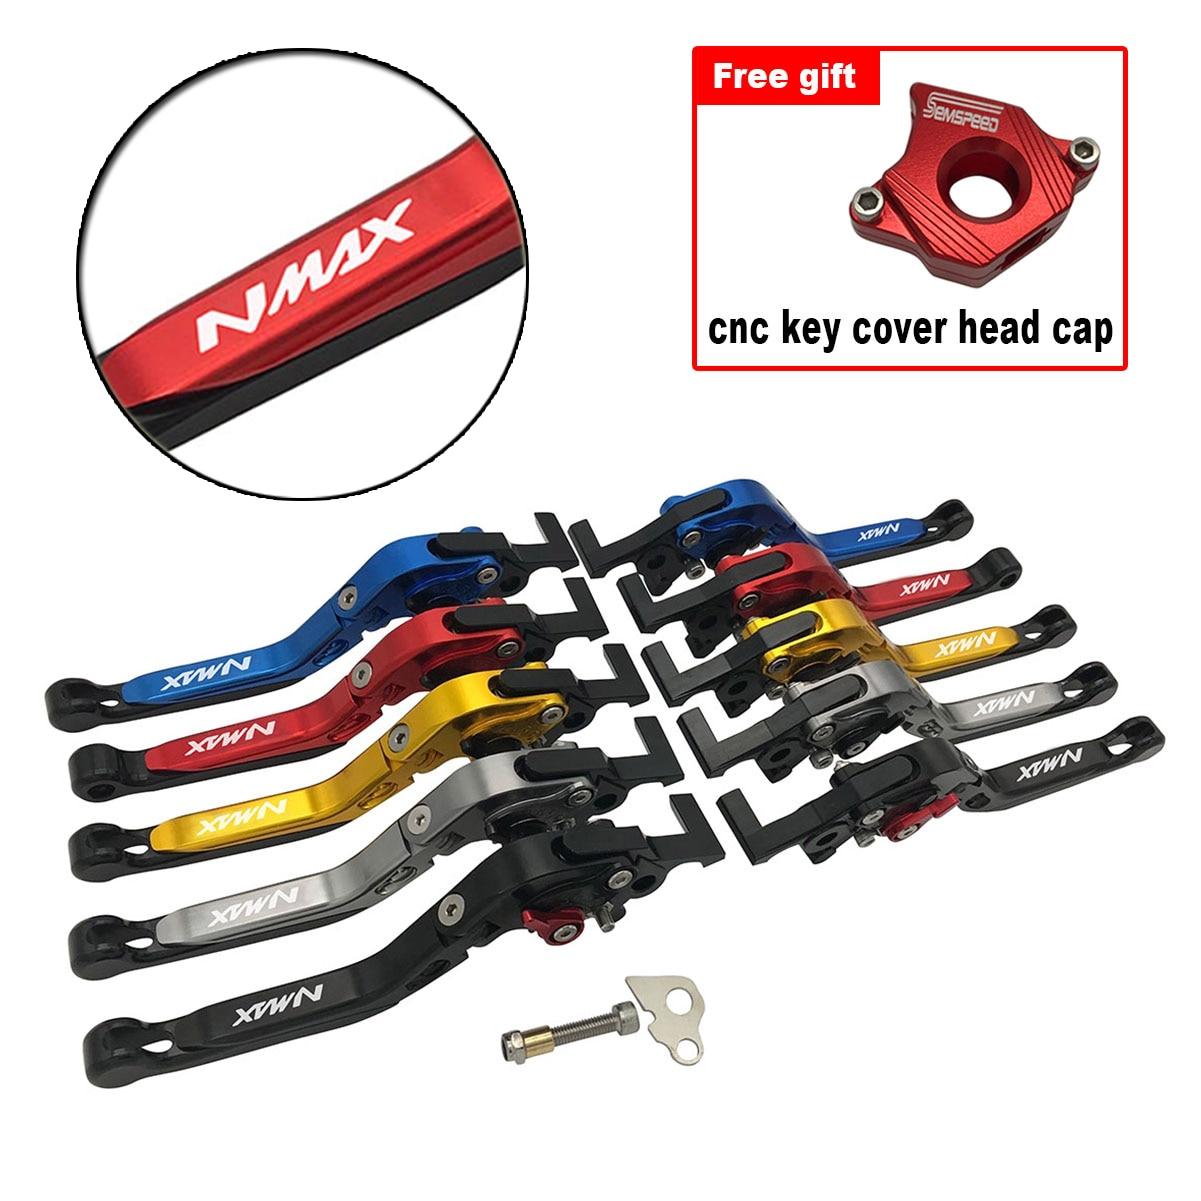 Alavancas de estacionamento chave kit capa para yamaha N-MAX 155 150 125 nmax 155 N-MAX 150 155 scooter folding extensíveis alavancas freio embreagem